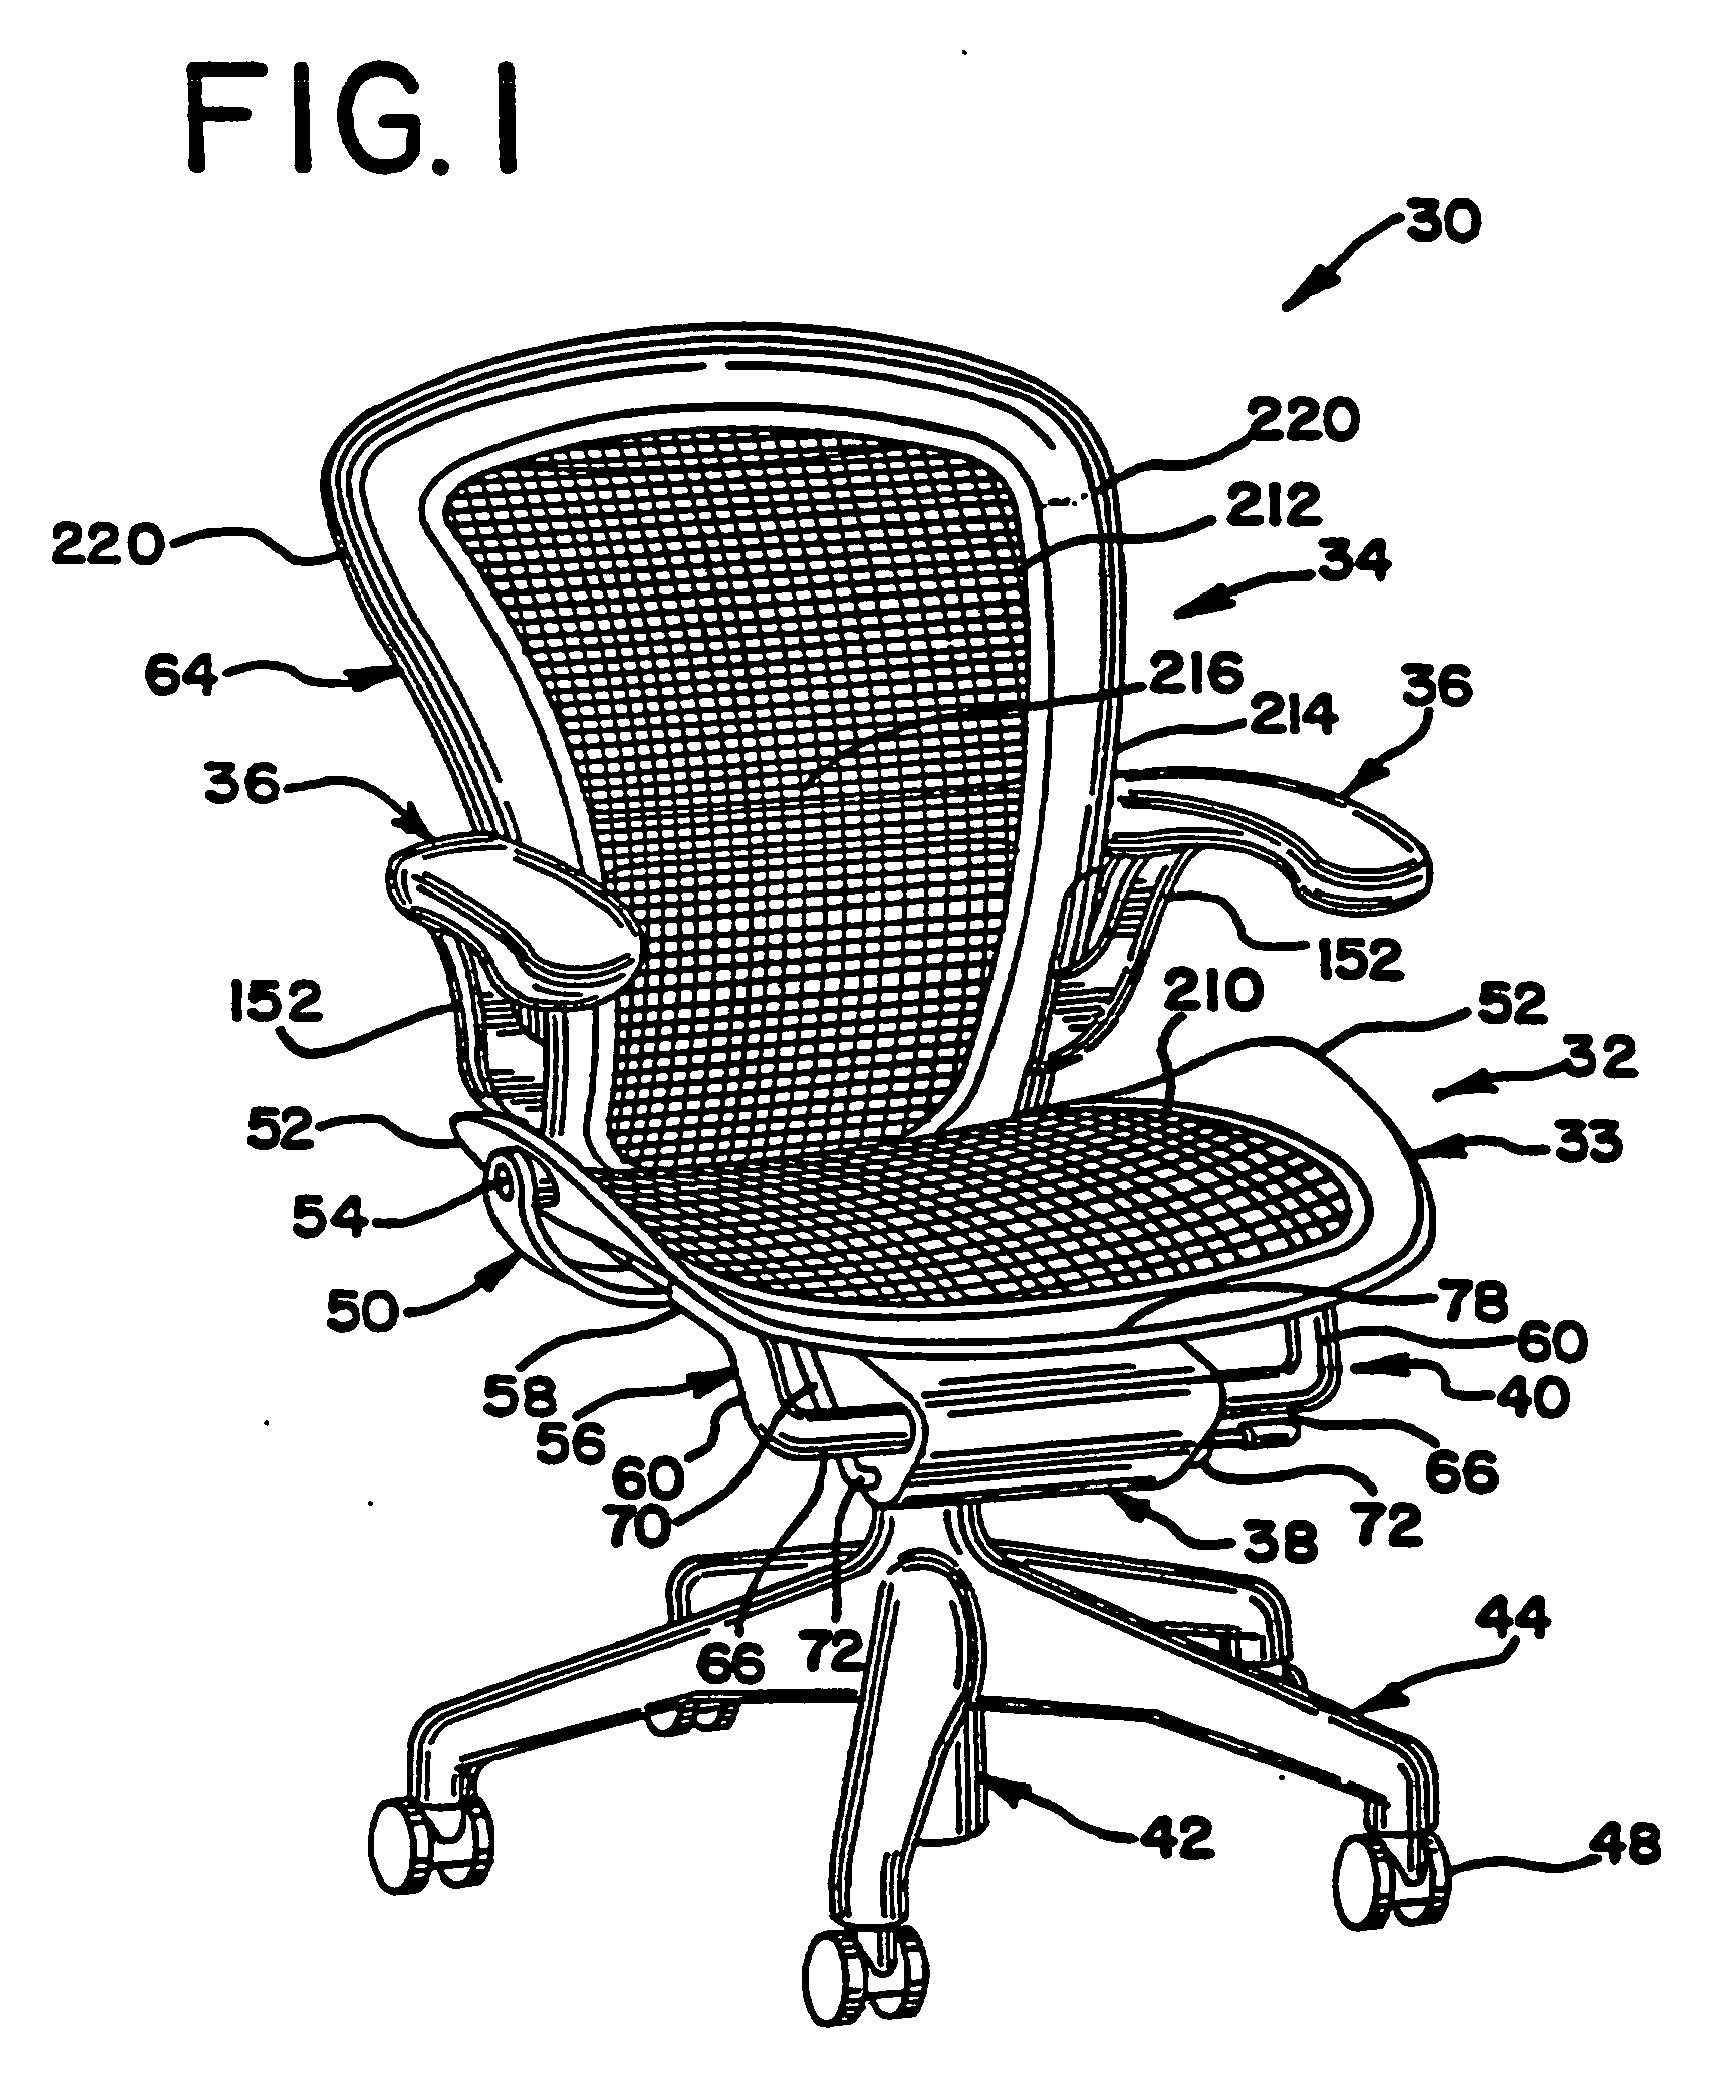 Patent ep0857443b1 tragkonstruktion f r einen stuhl for Stuhl design dwg